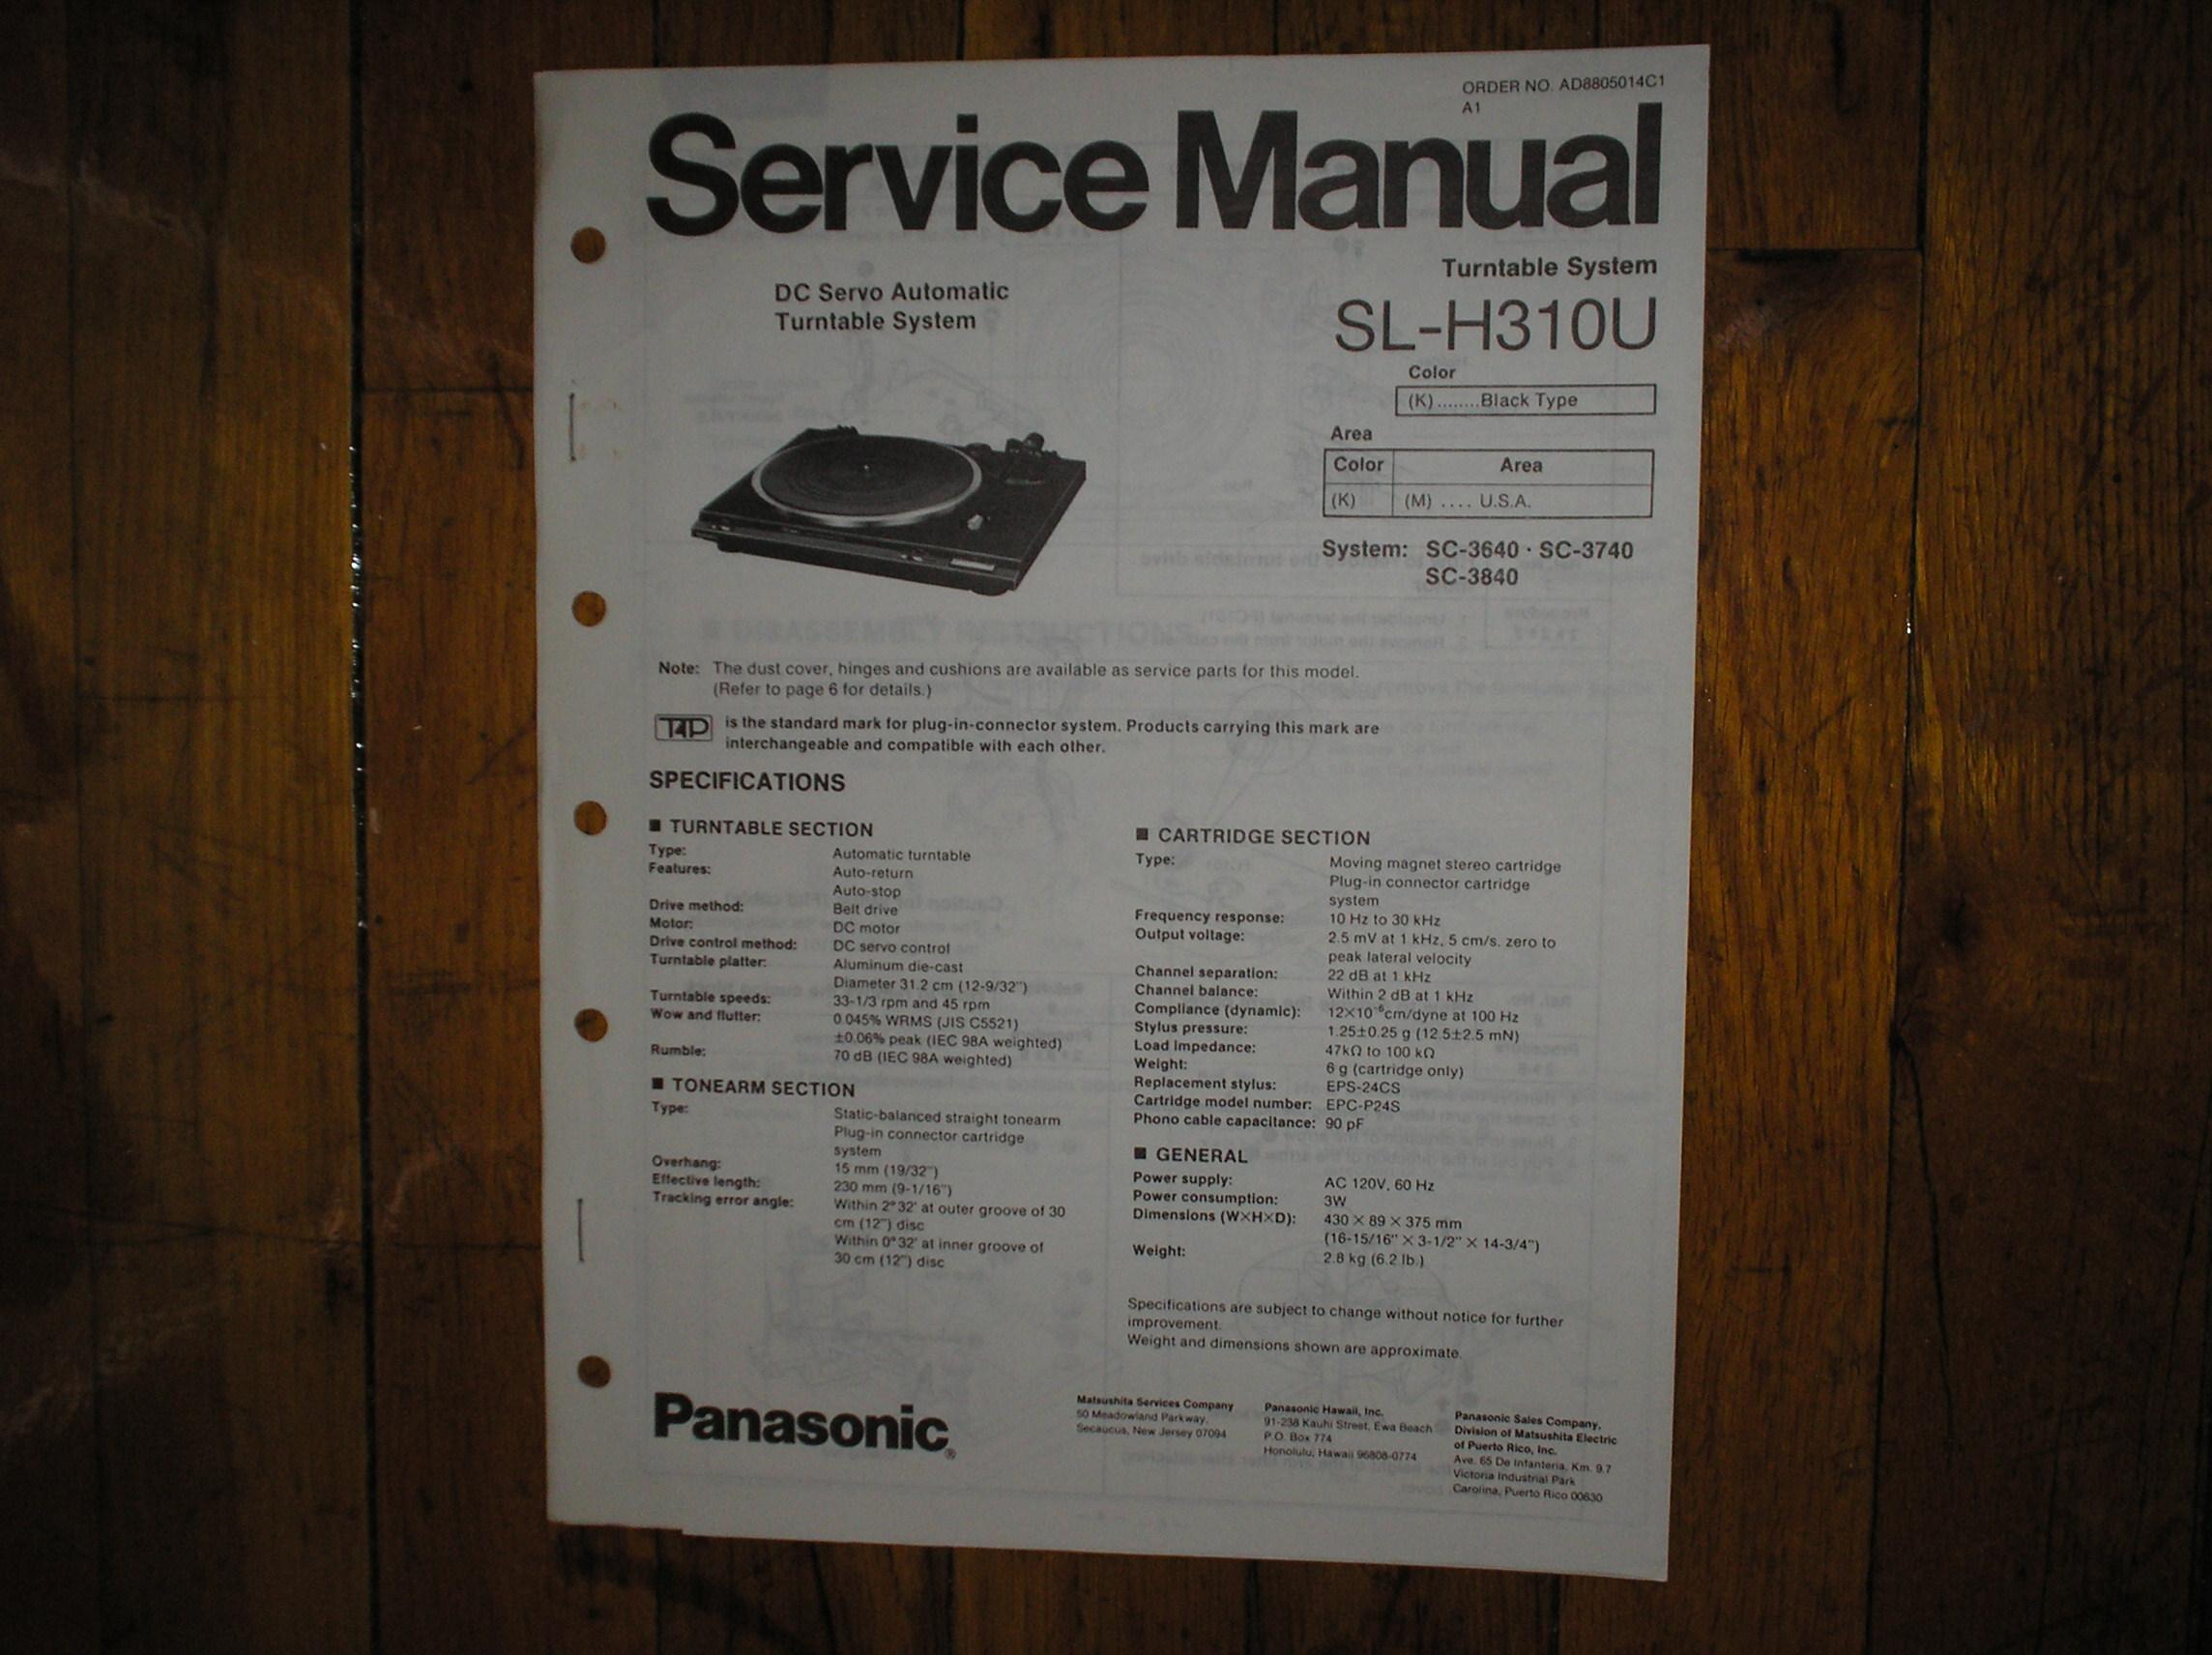 SL-H310U Turntable Service Manual